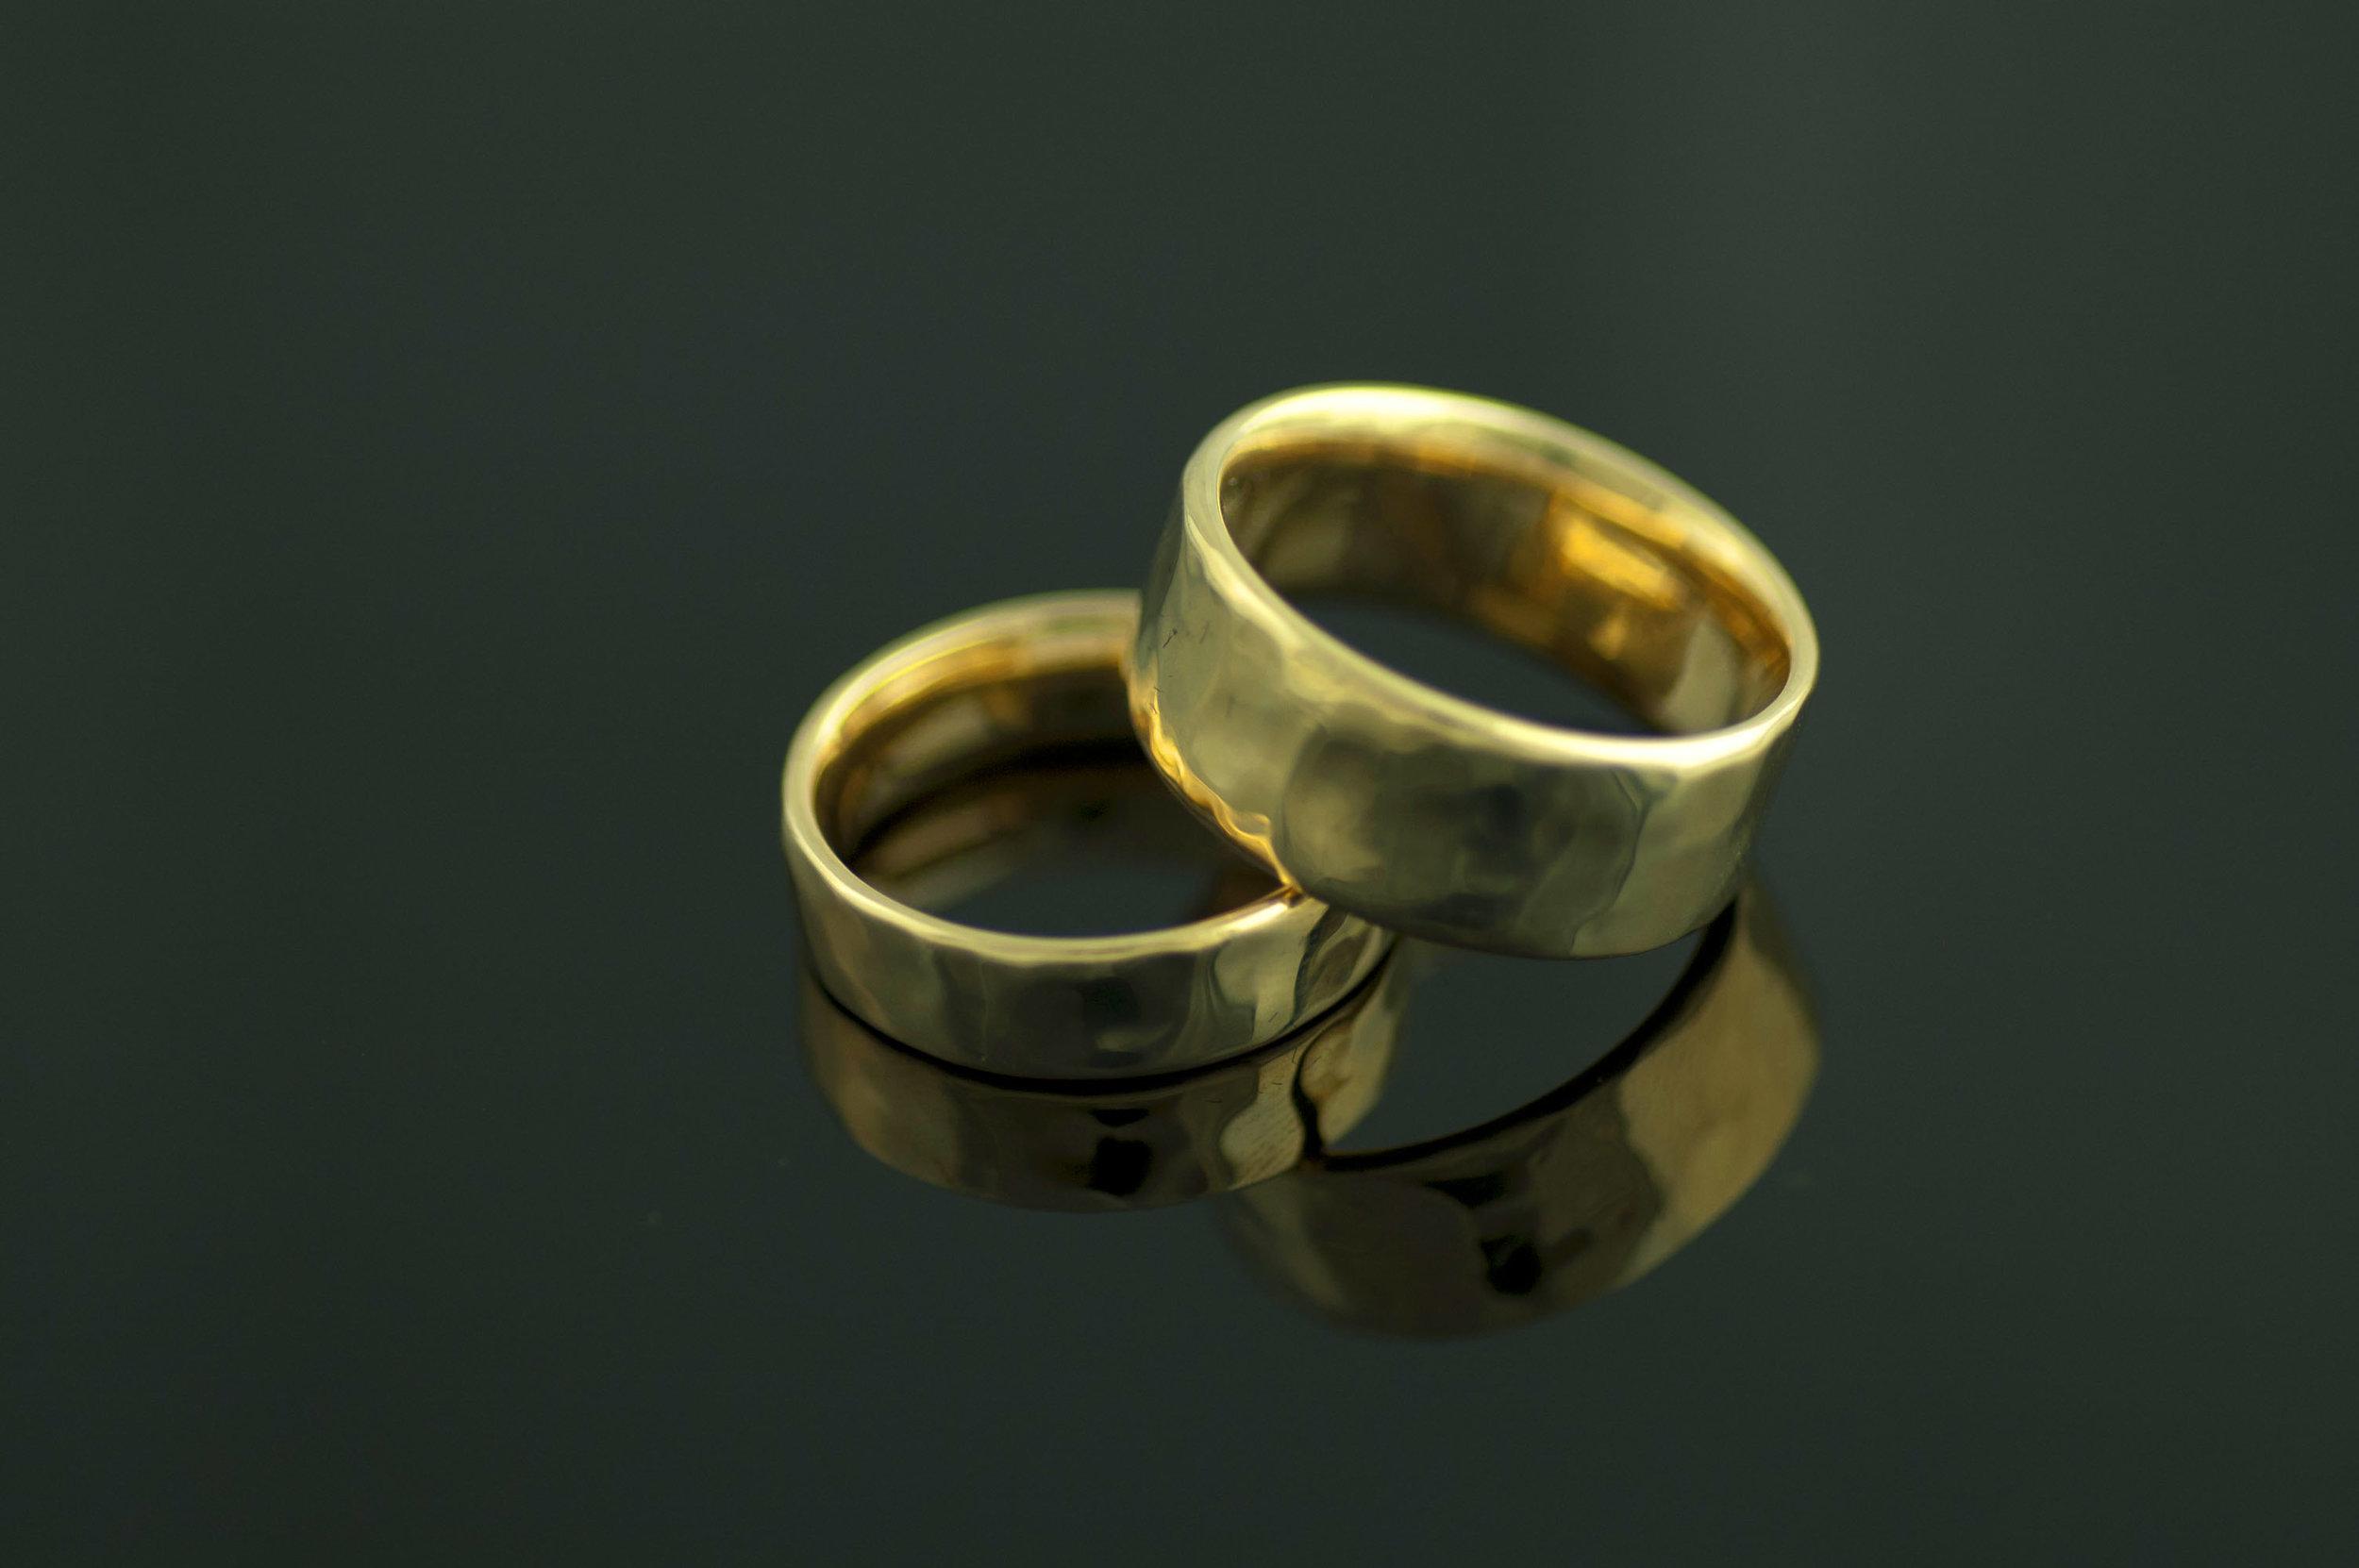 darvier-soft-hammer-finish-wedding-set-gold-is-gold.jpg